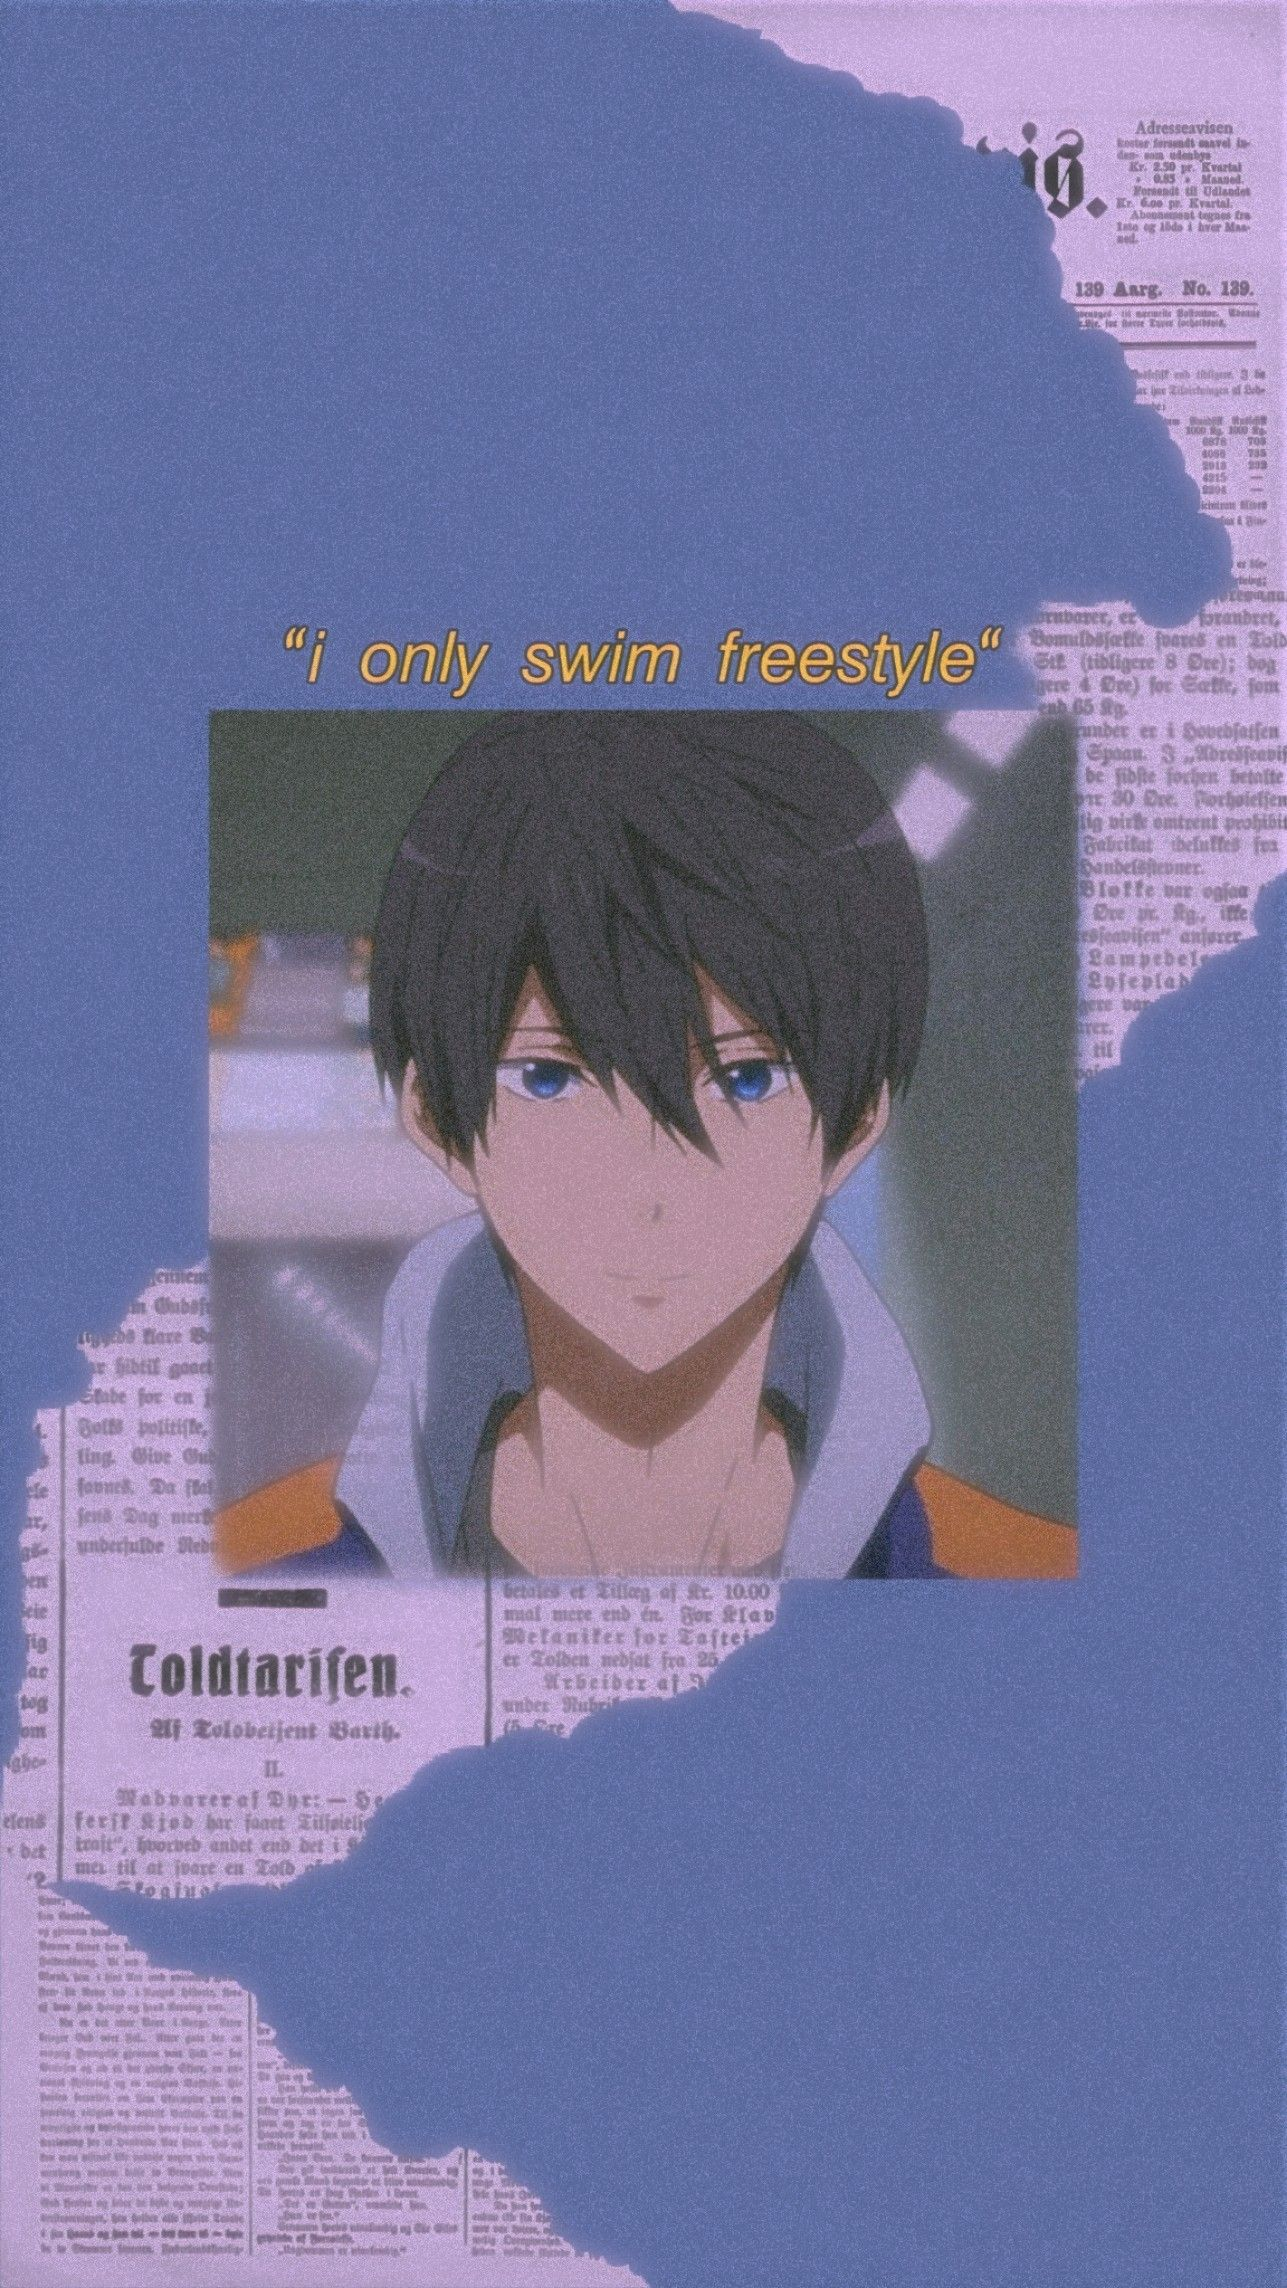 Anime wallpaper iphone free